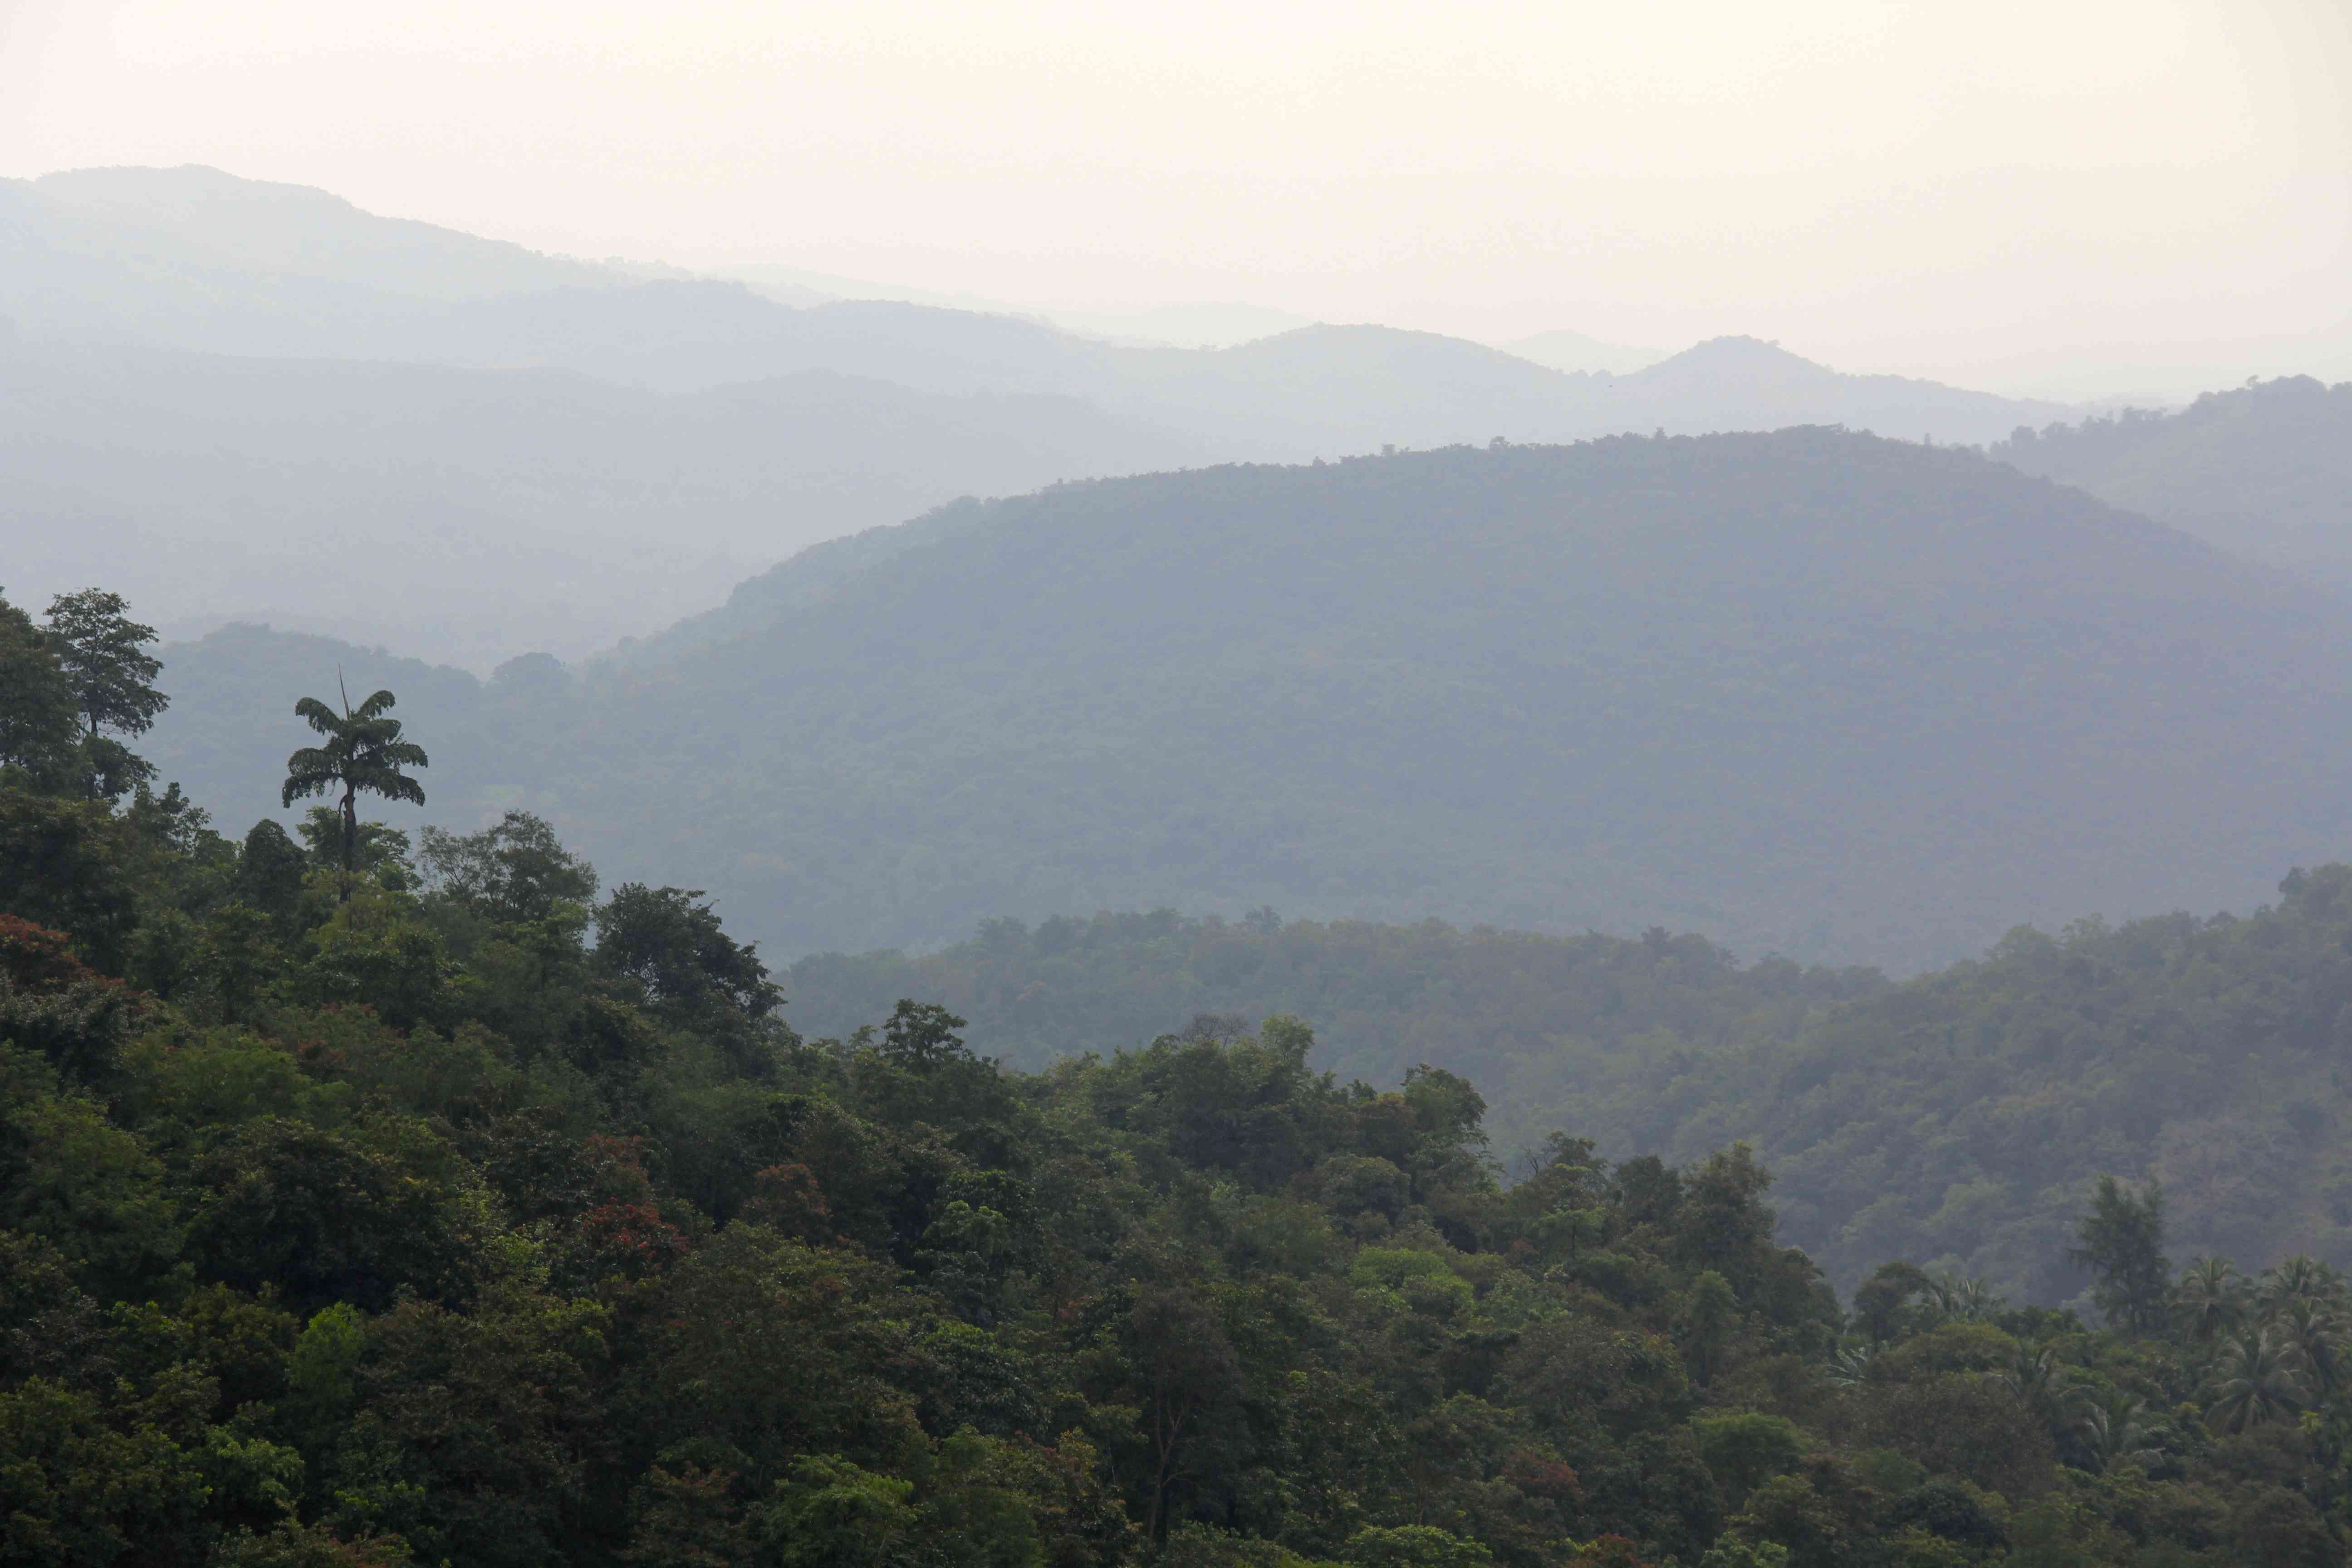 Forest and mountains in the Sawantwadi-Dodamarg wildlife corridor